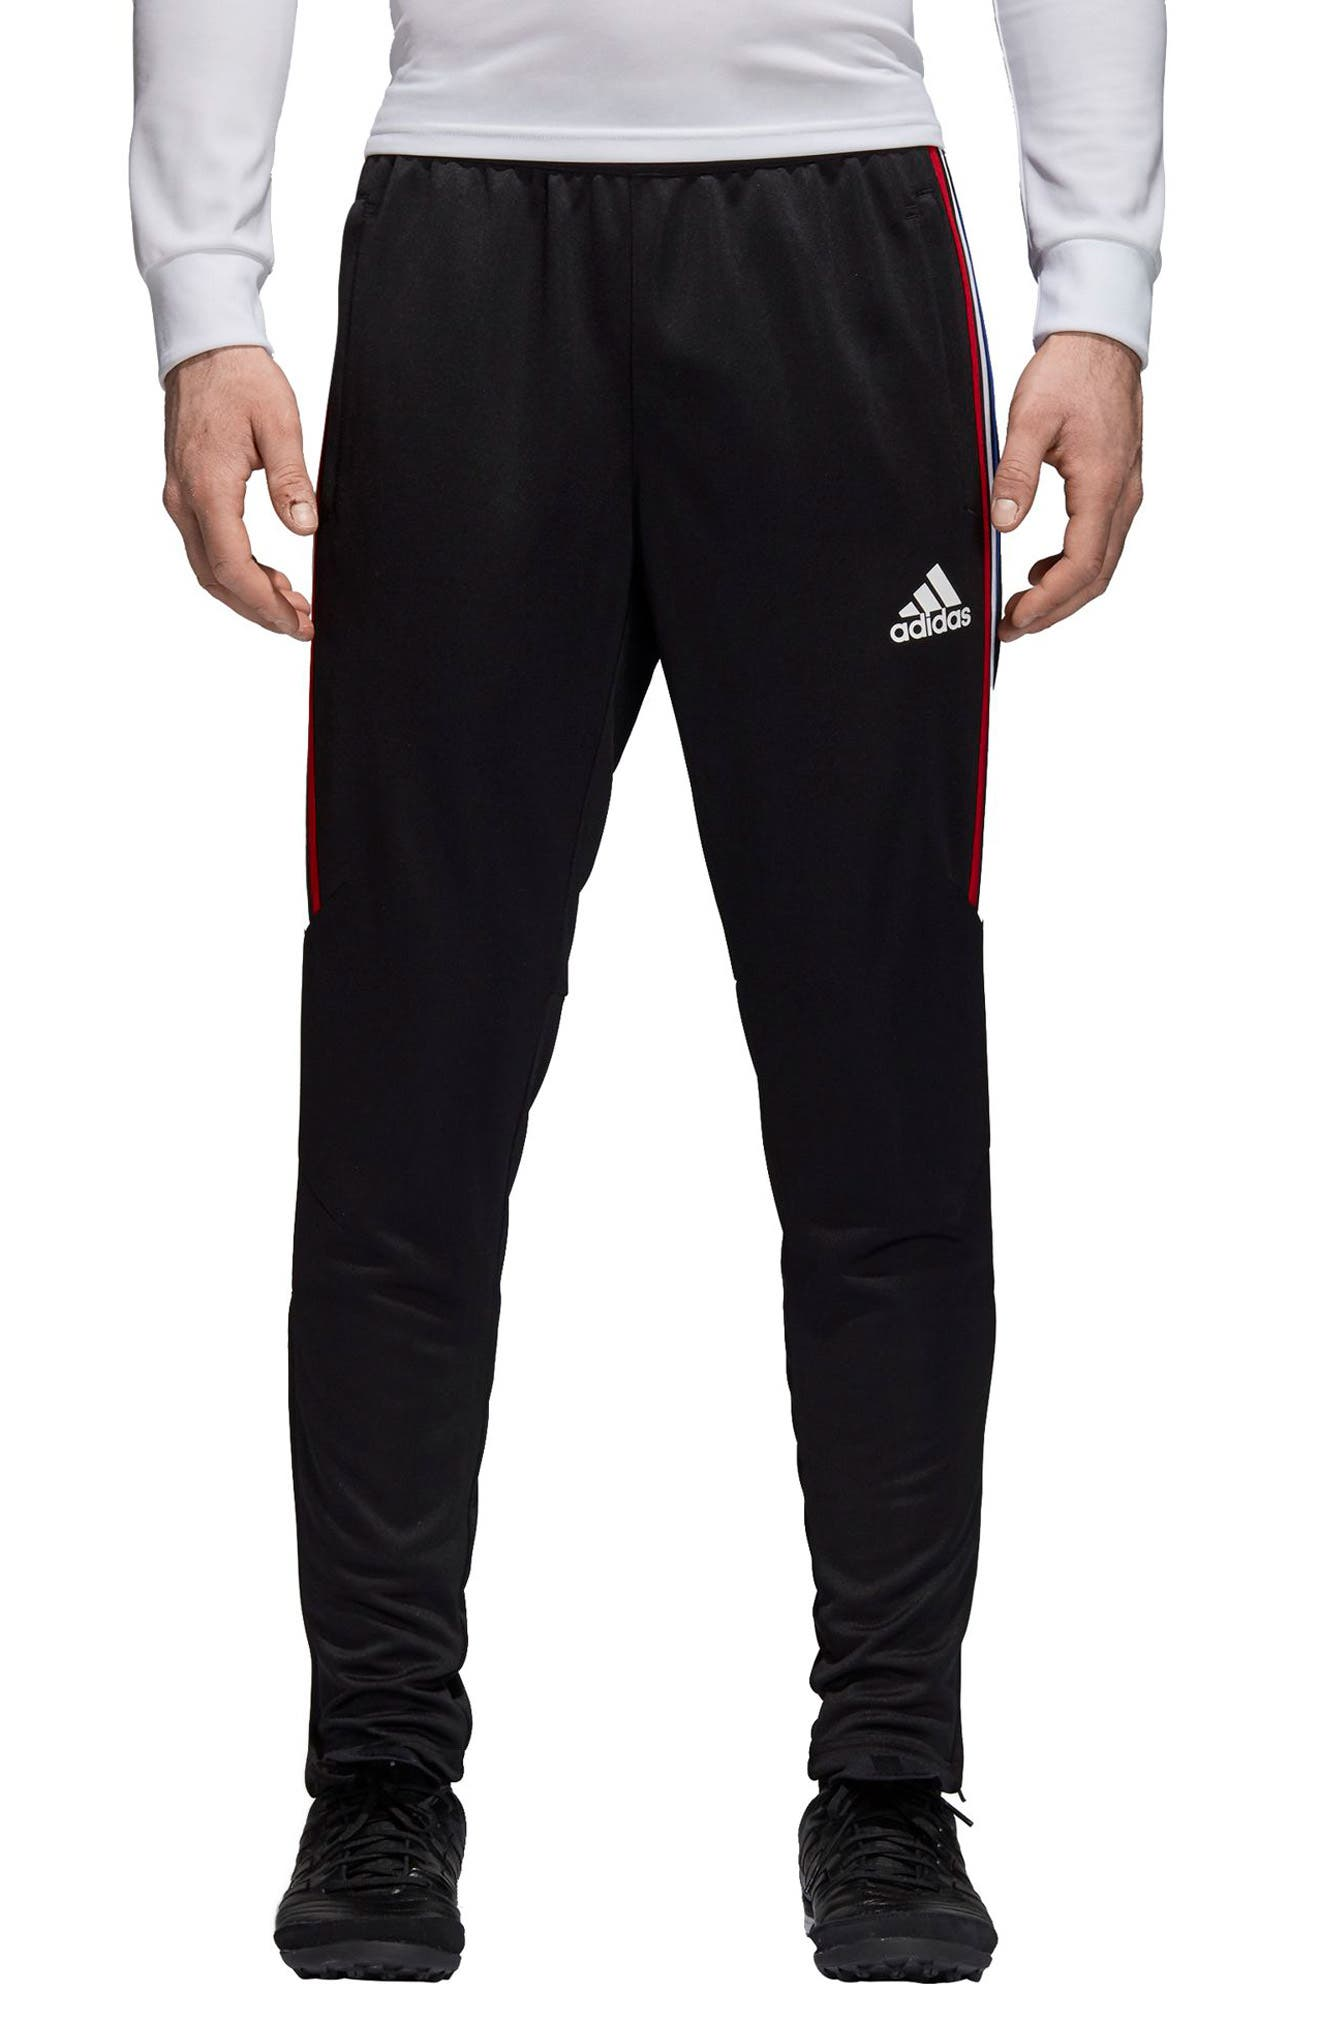 ADIDAS, Tiro 17 Regular Fit Training Pants, Main thumbnail 1, color, BLACK/ RED/ WHITE/ BLUE